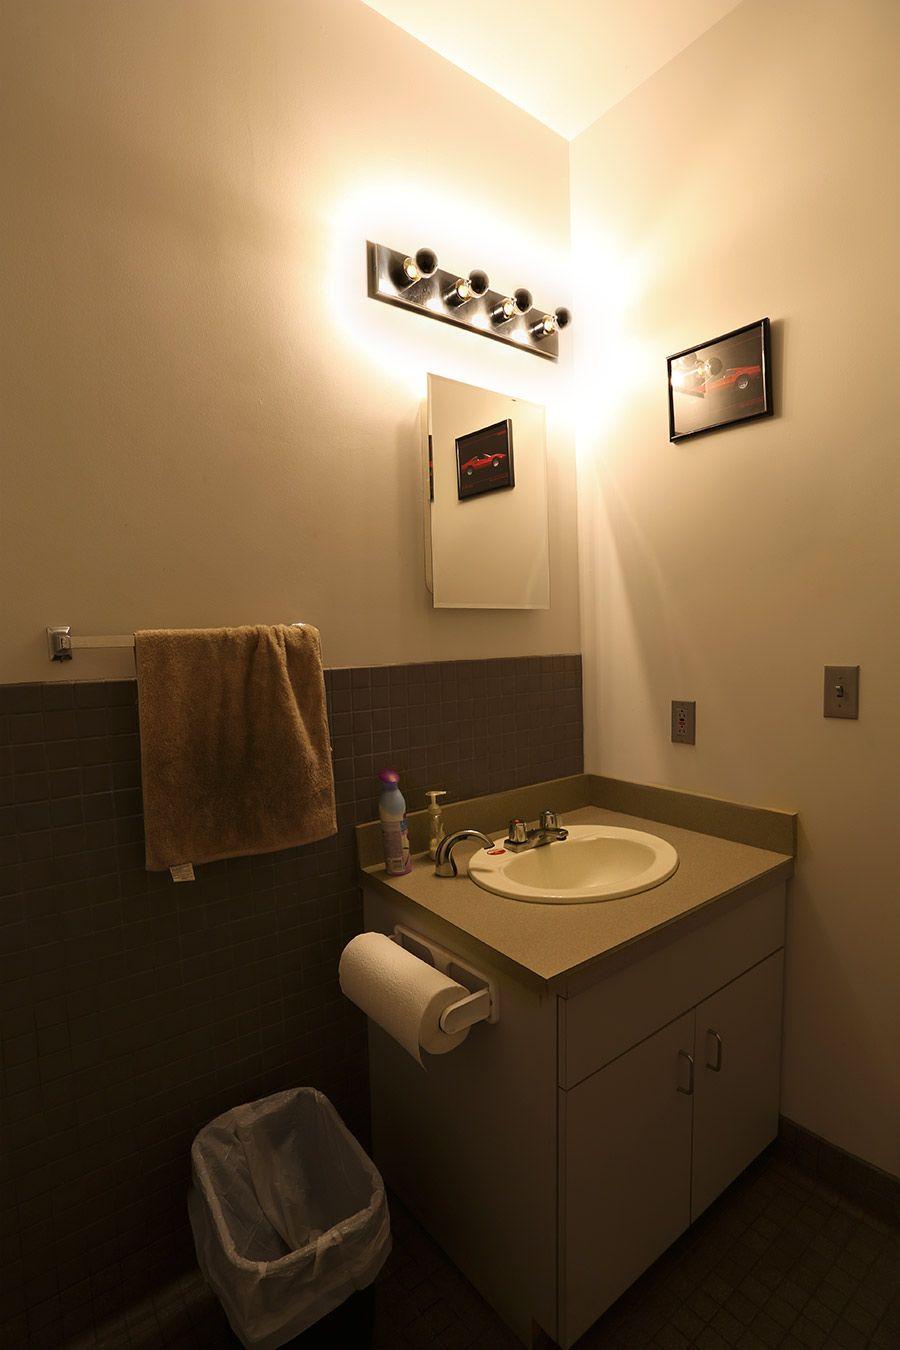 Cool bathroom vanity light bulbs trend bathroom vanity light bulbs cool bathroom vanity light bulbs trend bathroom vanity light bulbs 78 in home decor ideas aloadofball Gallery